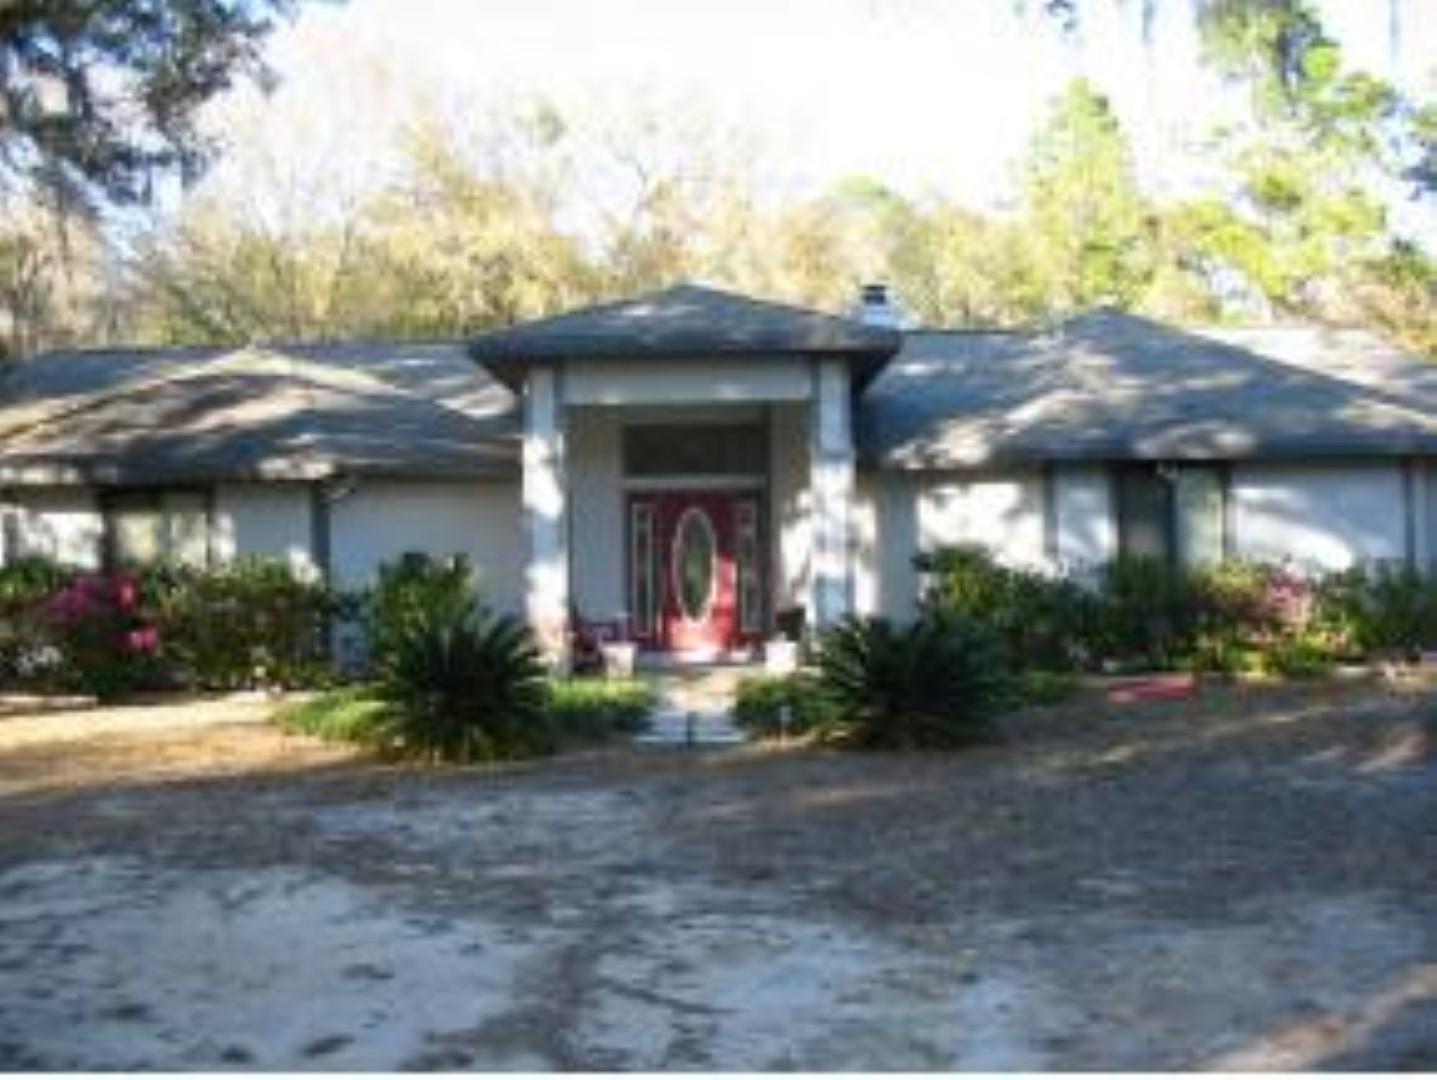 8911 Cereus Way, Cyrstal River, Florida 34428